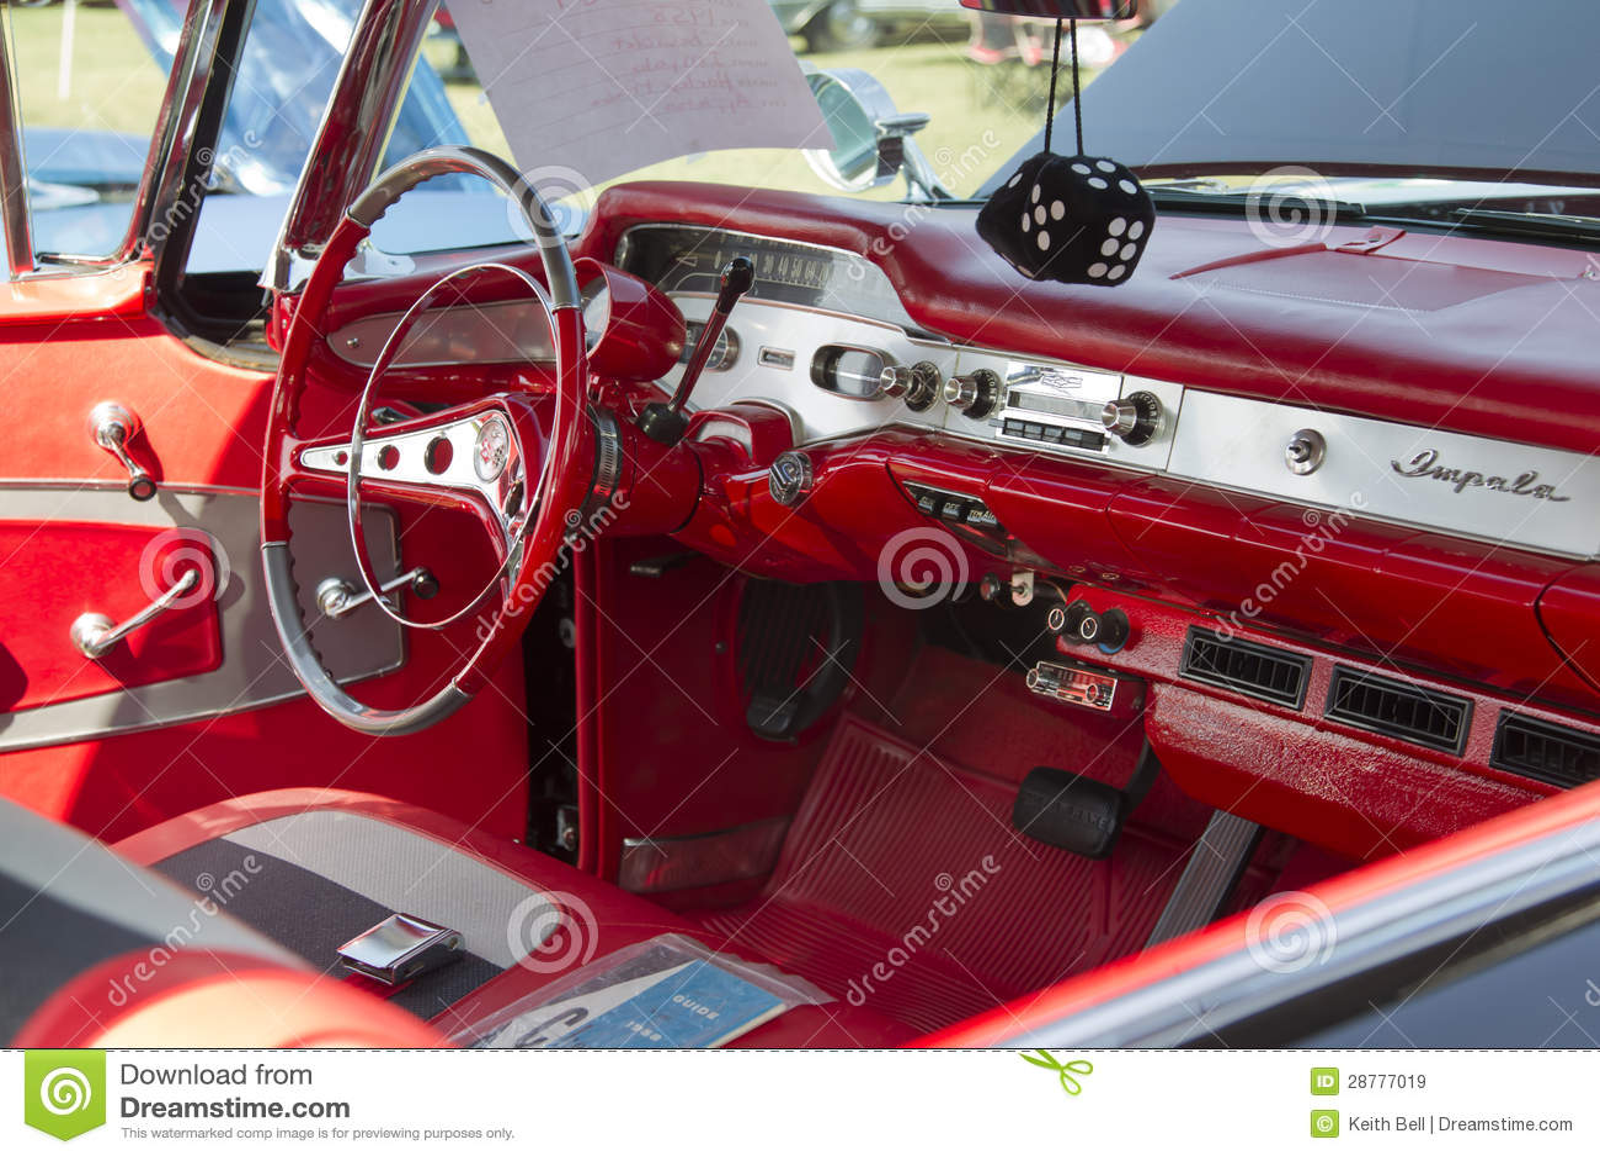 Filename 1958 black chevy impala interior 28777019 jpg